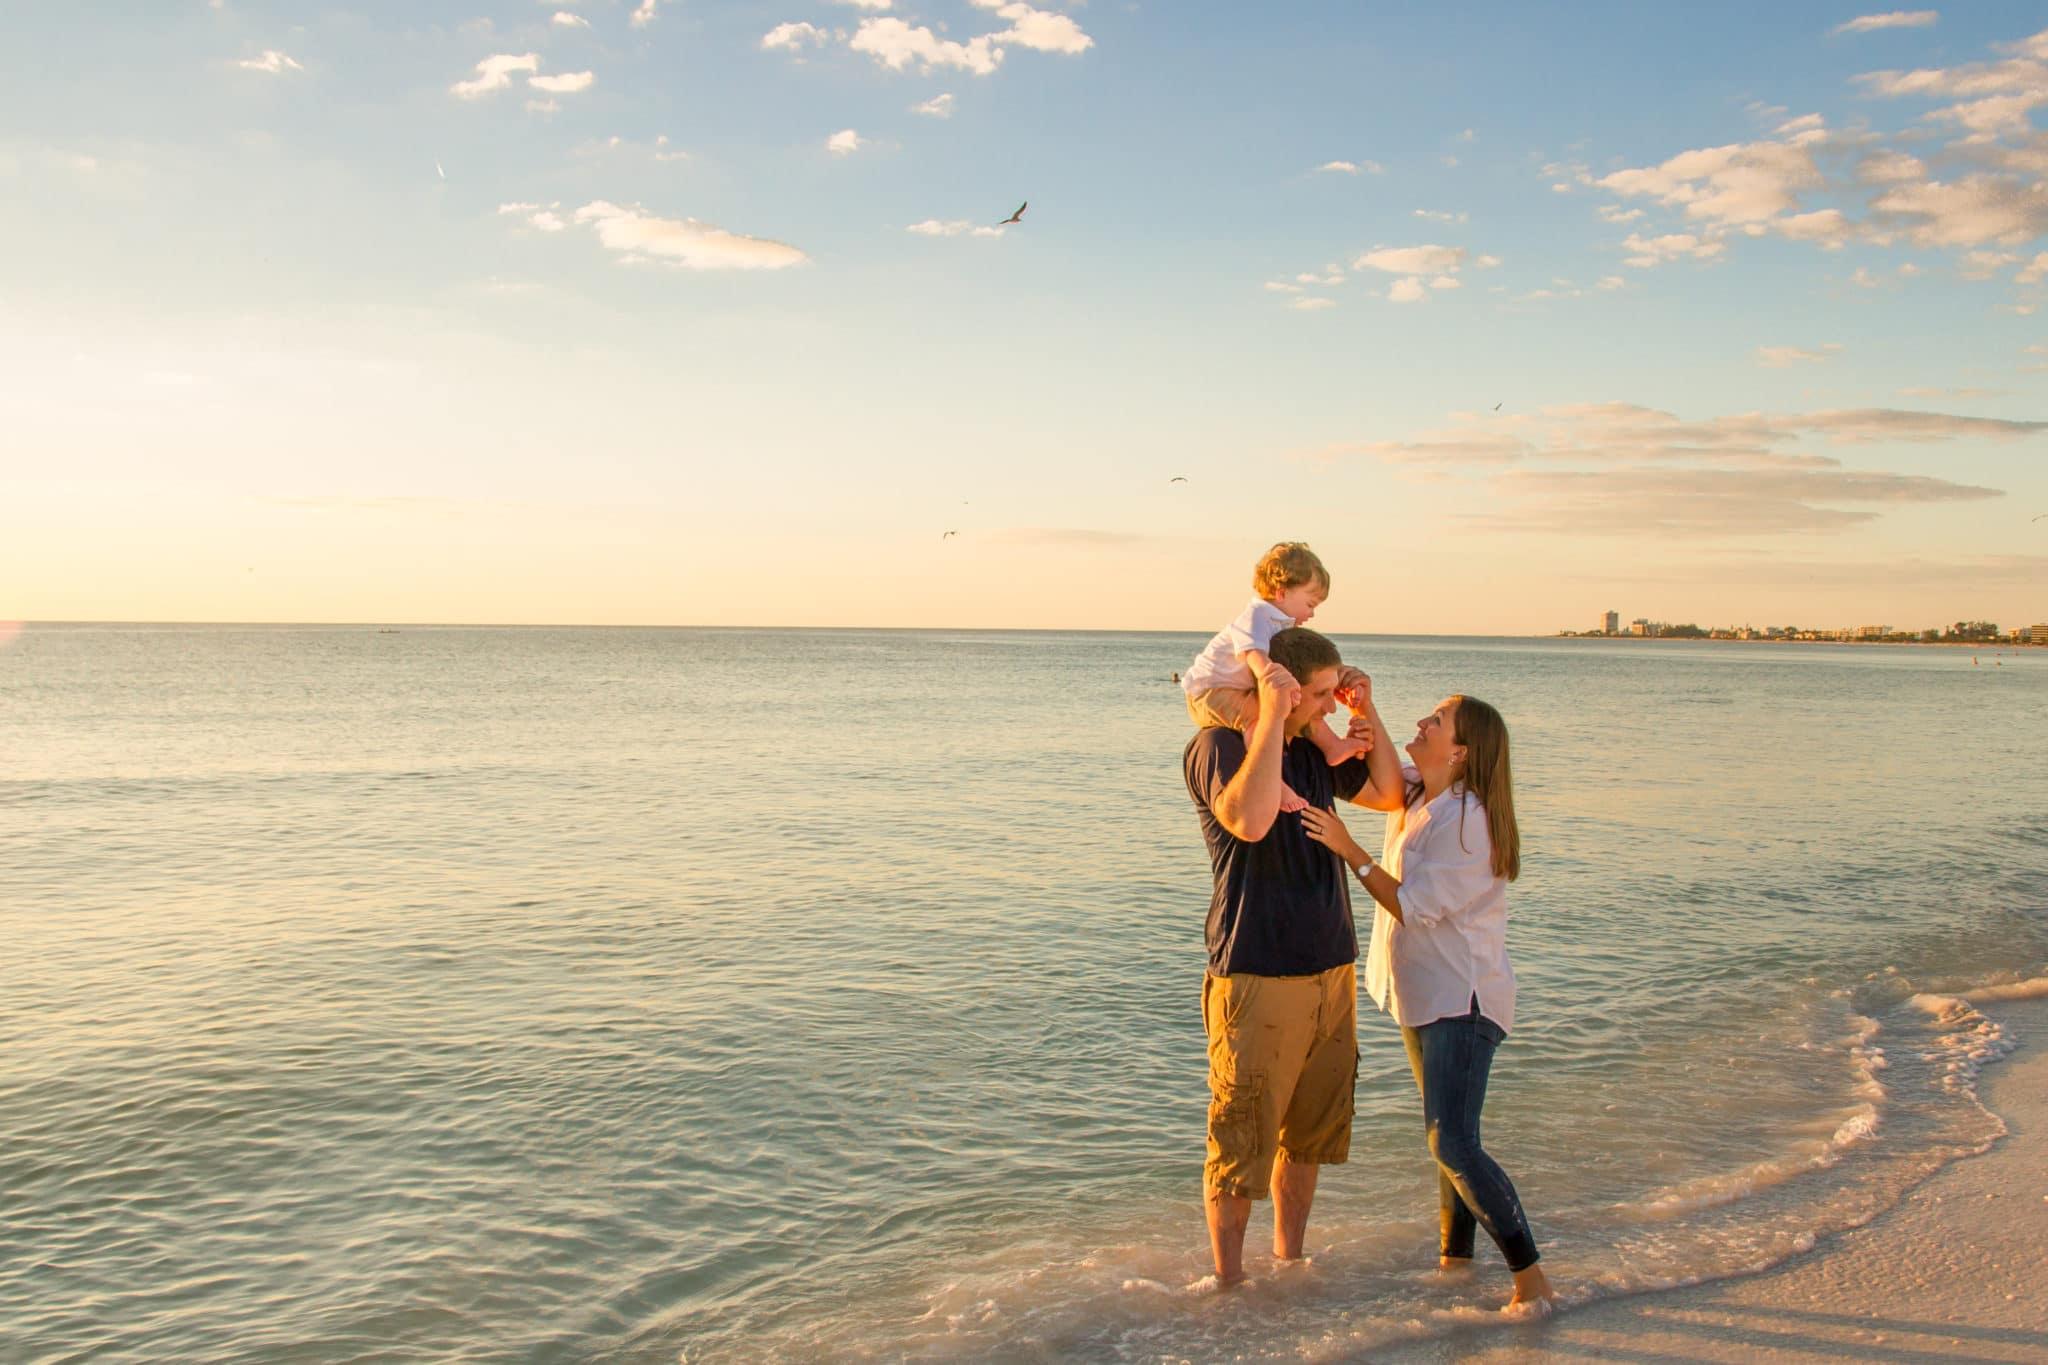 Family beach photography in siesta key fl